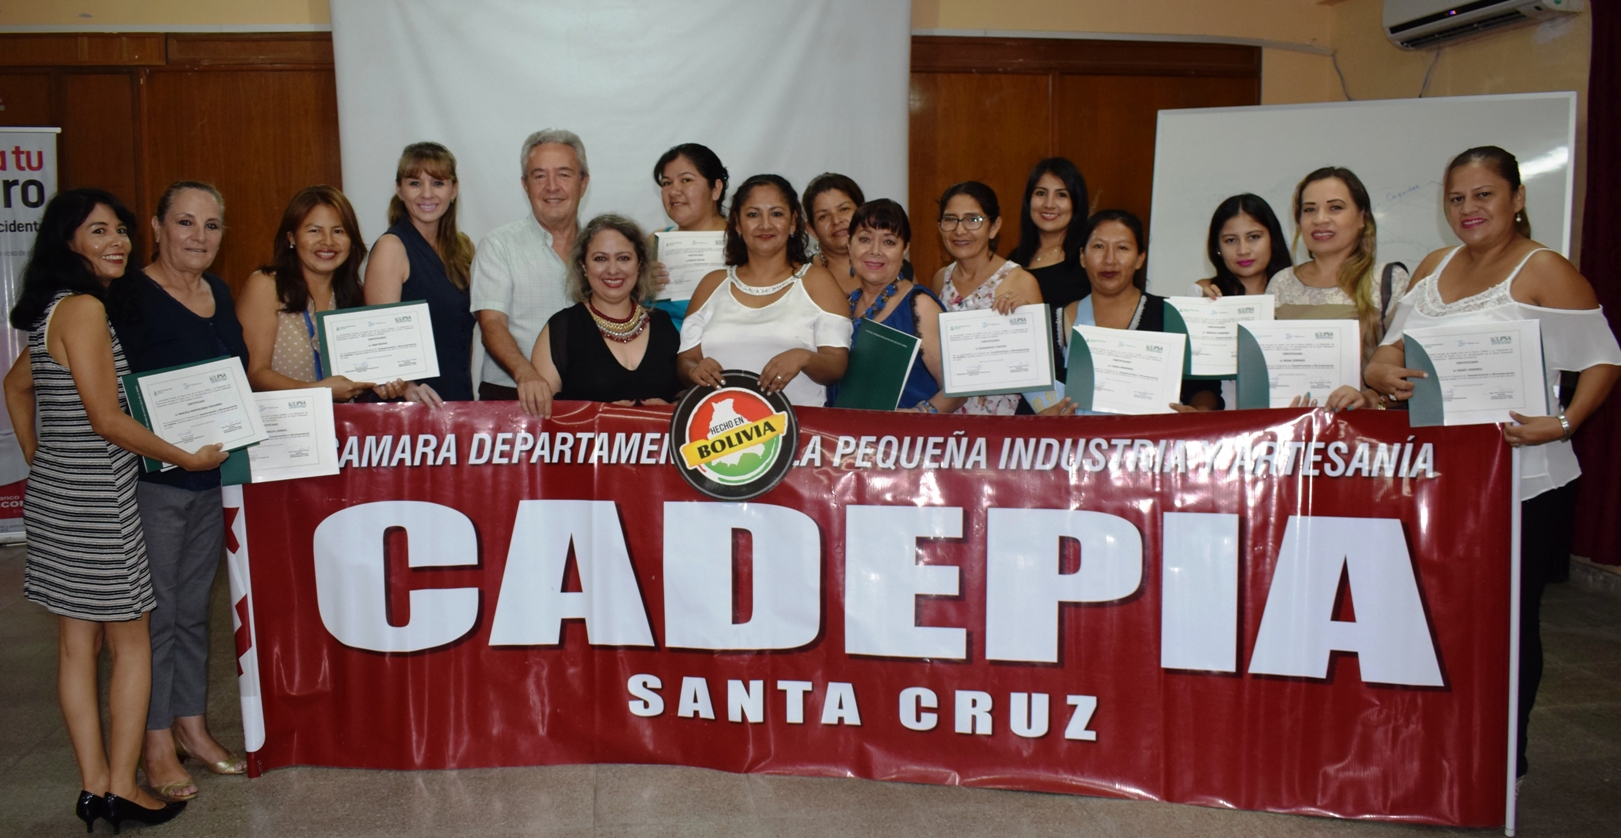 Microempresarios de CADEPIA reciben certificados para emprender negocios